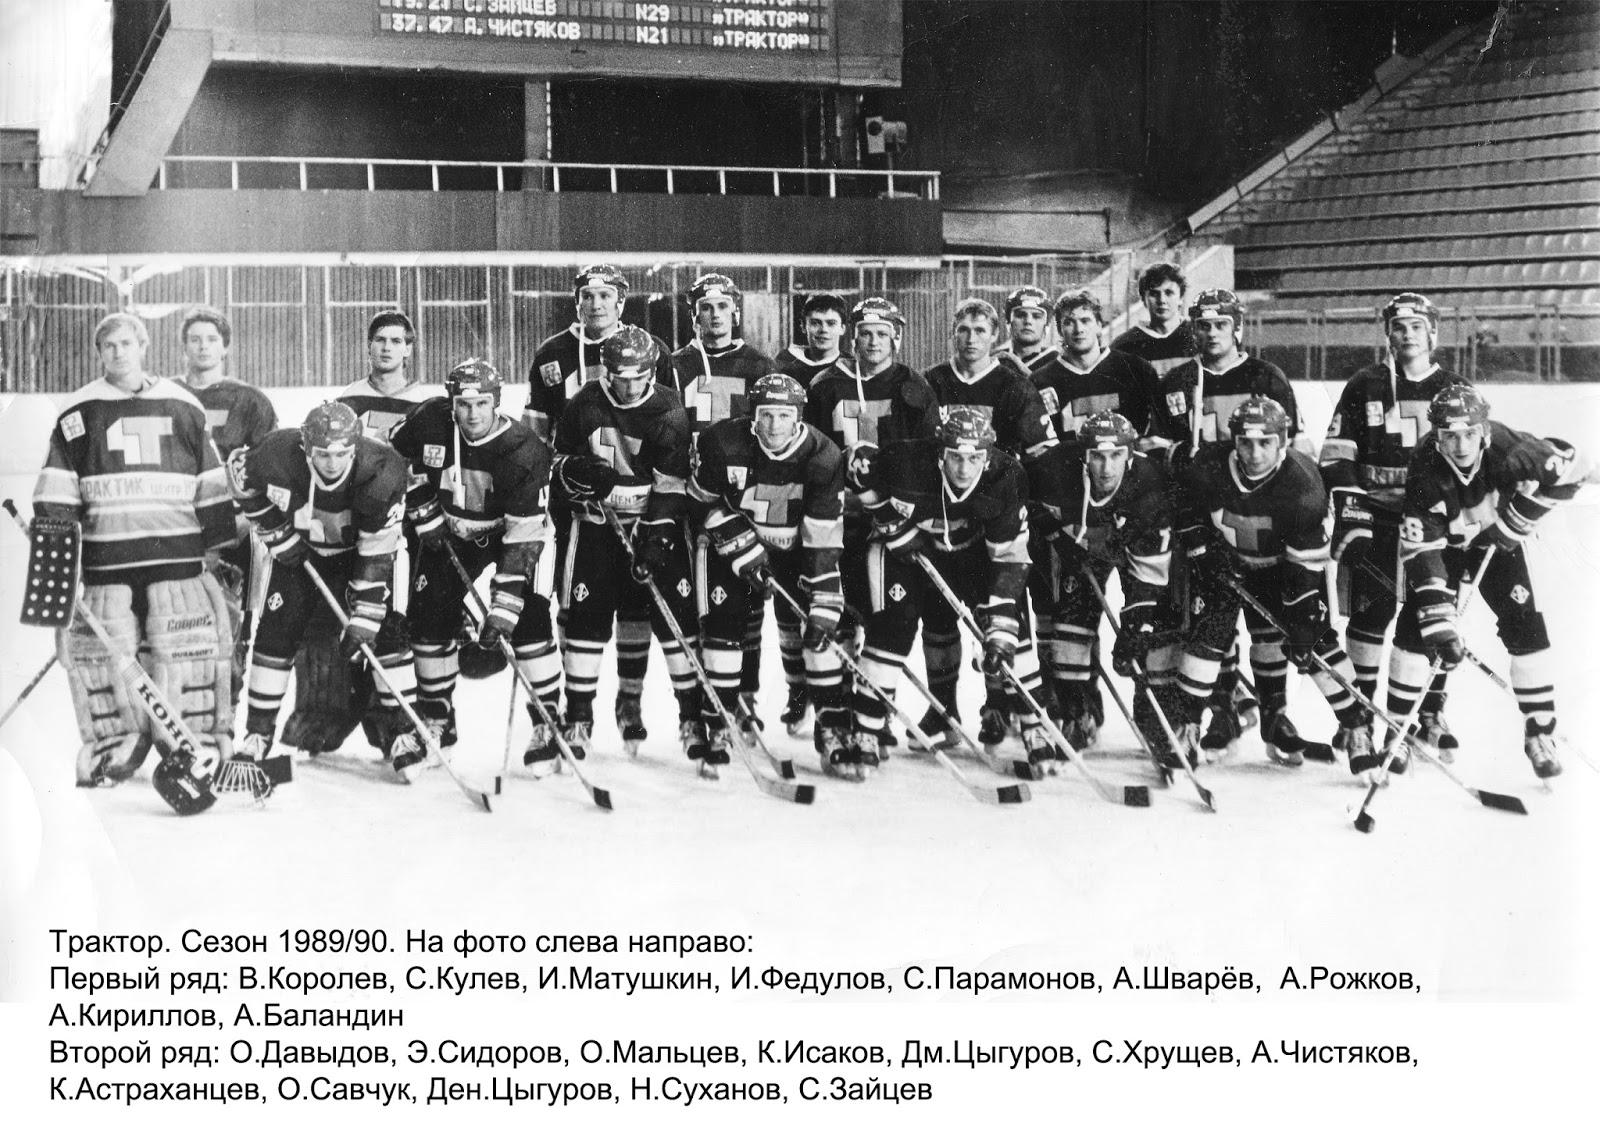 хоккей савчук олег